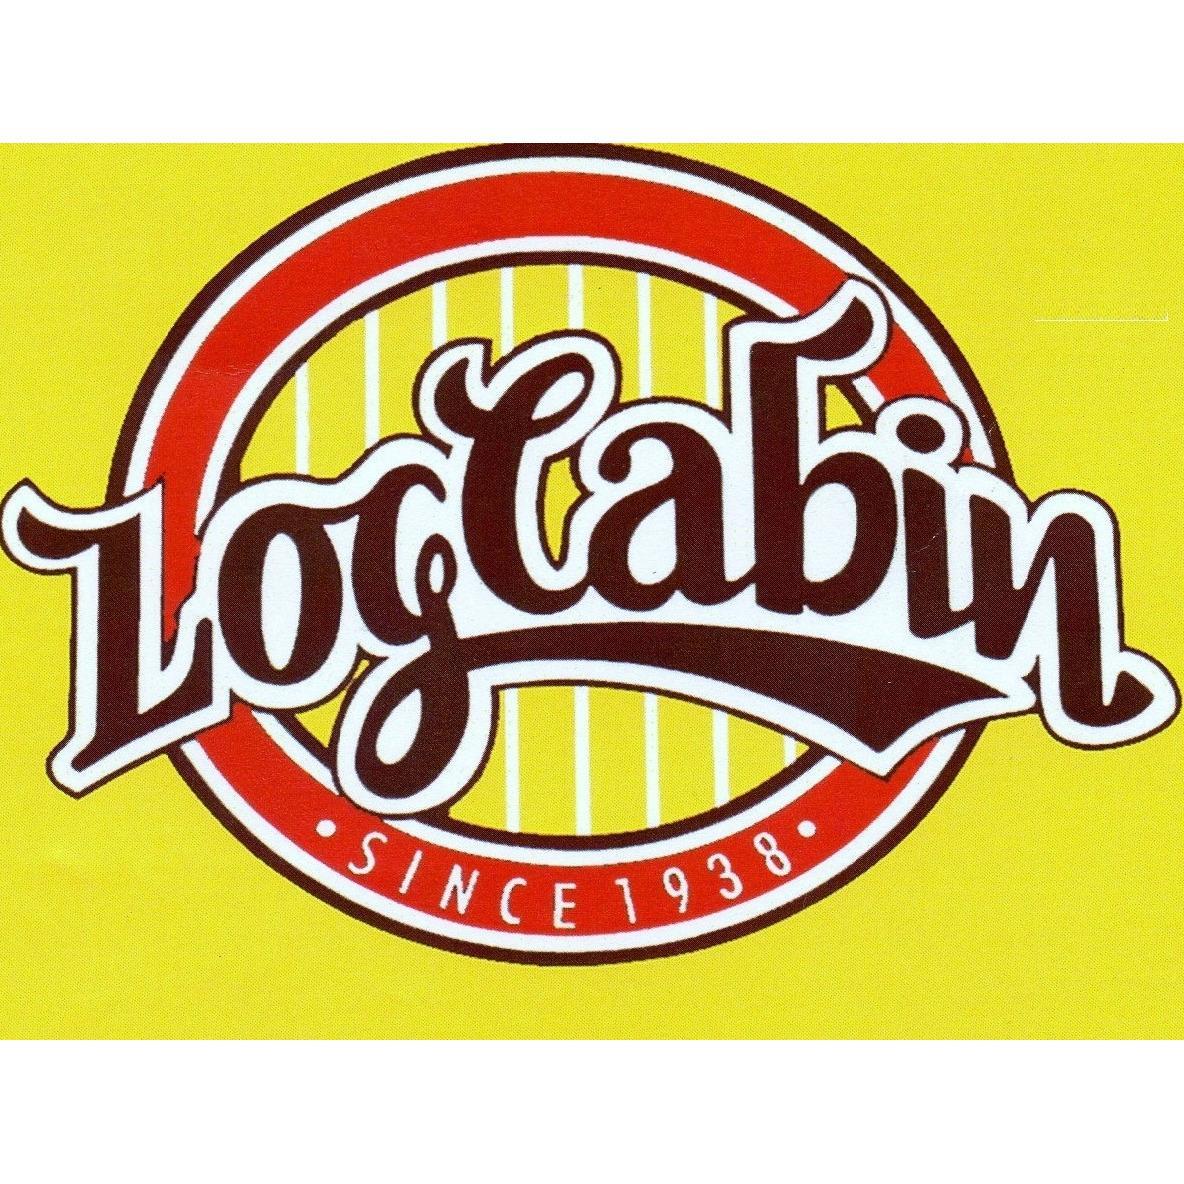 Log Cabin Cocktail Lounge image 1